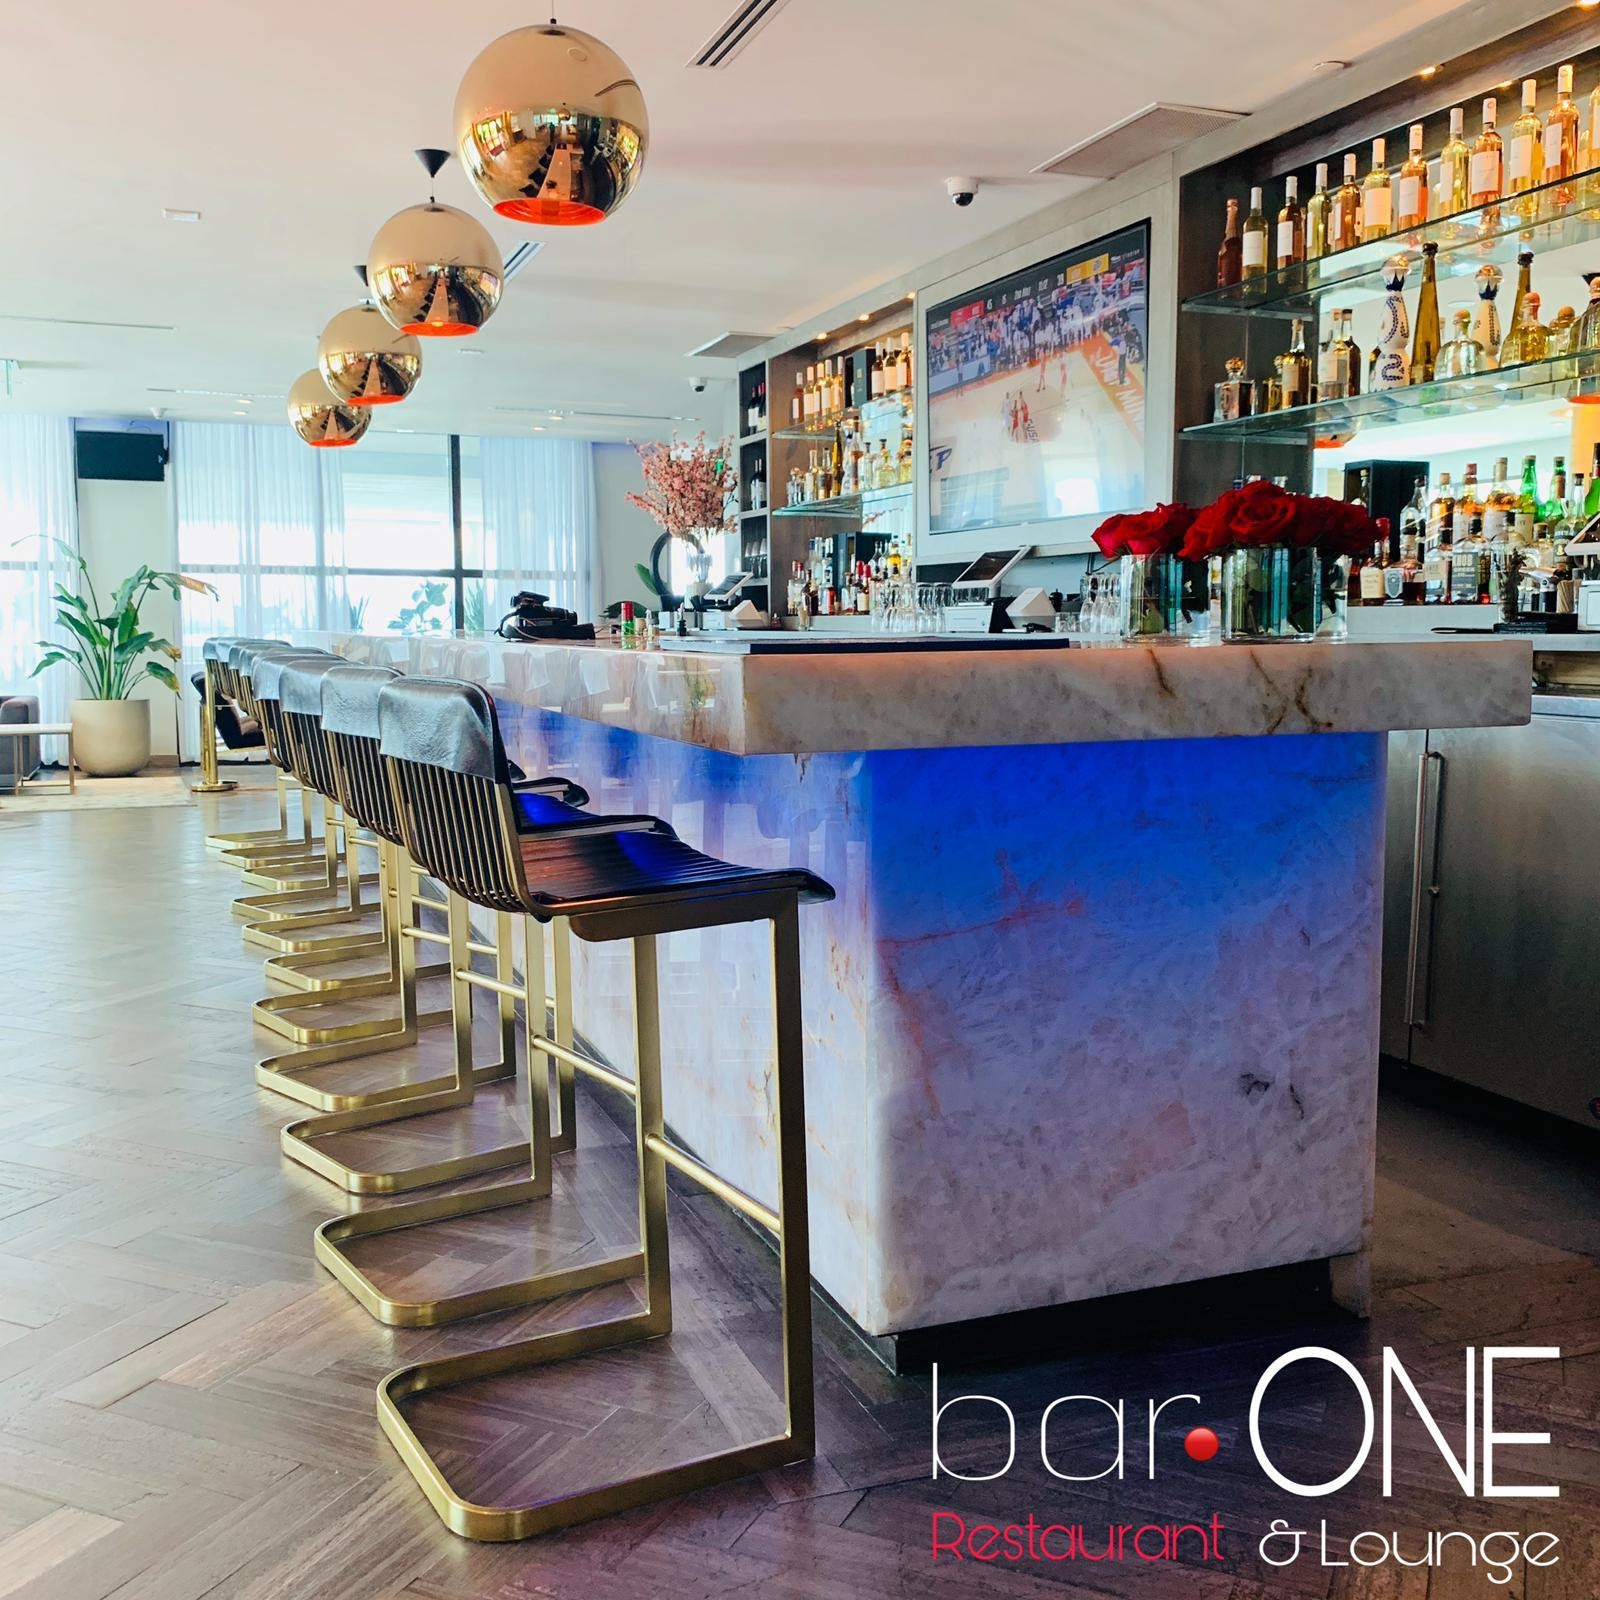 bar one miami beach celebrates its first anniversary